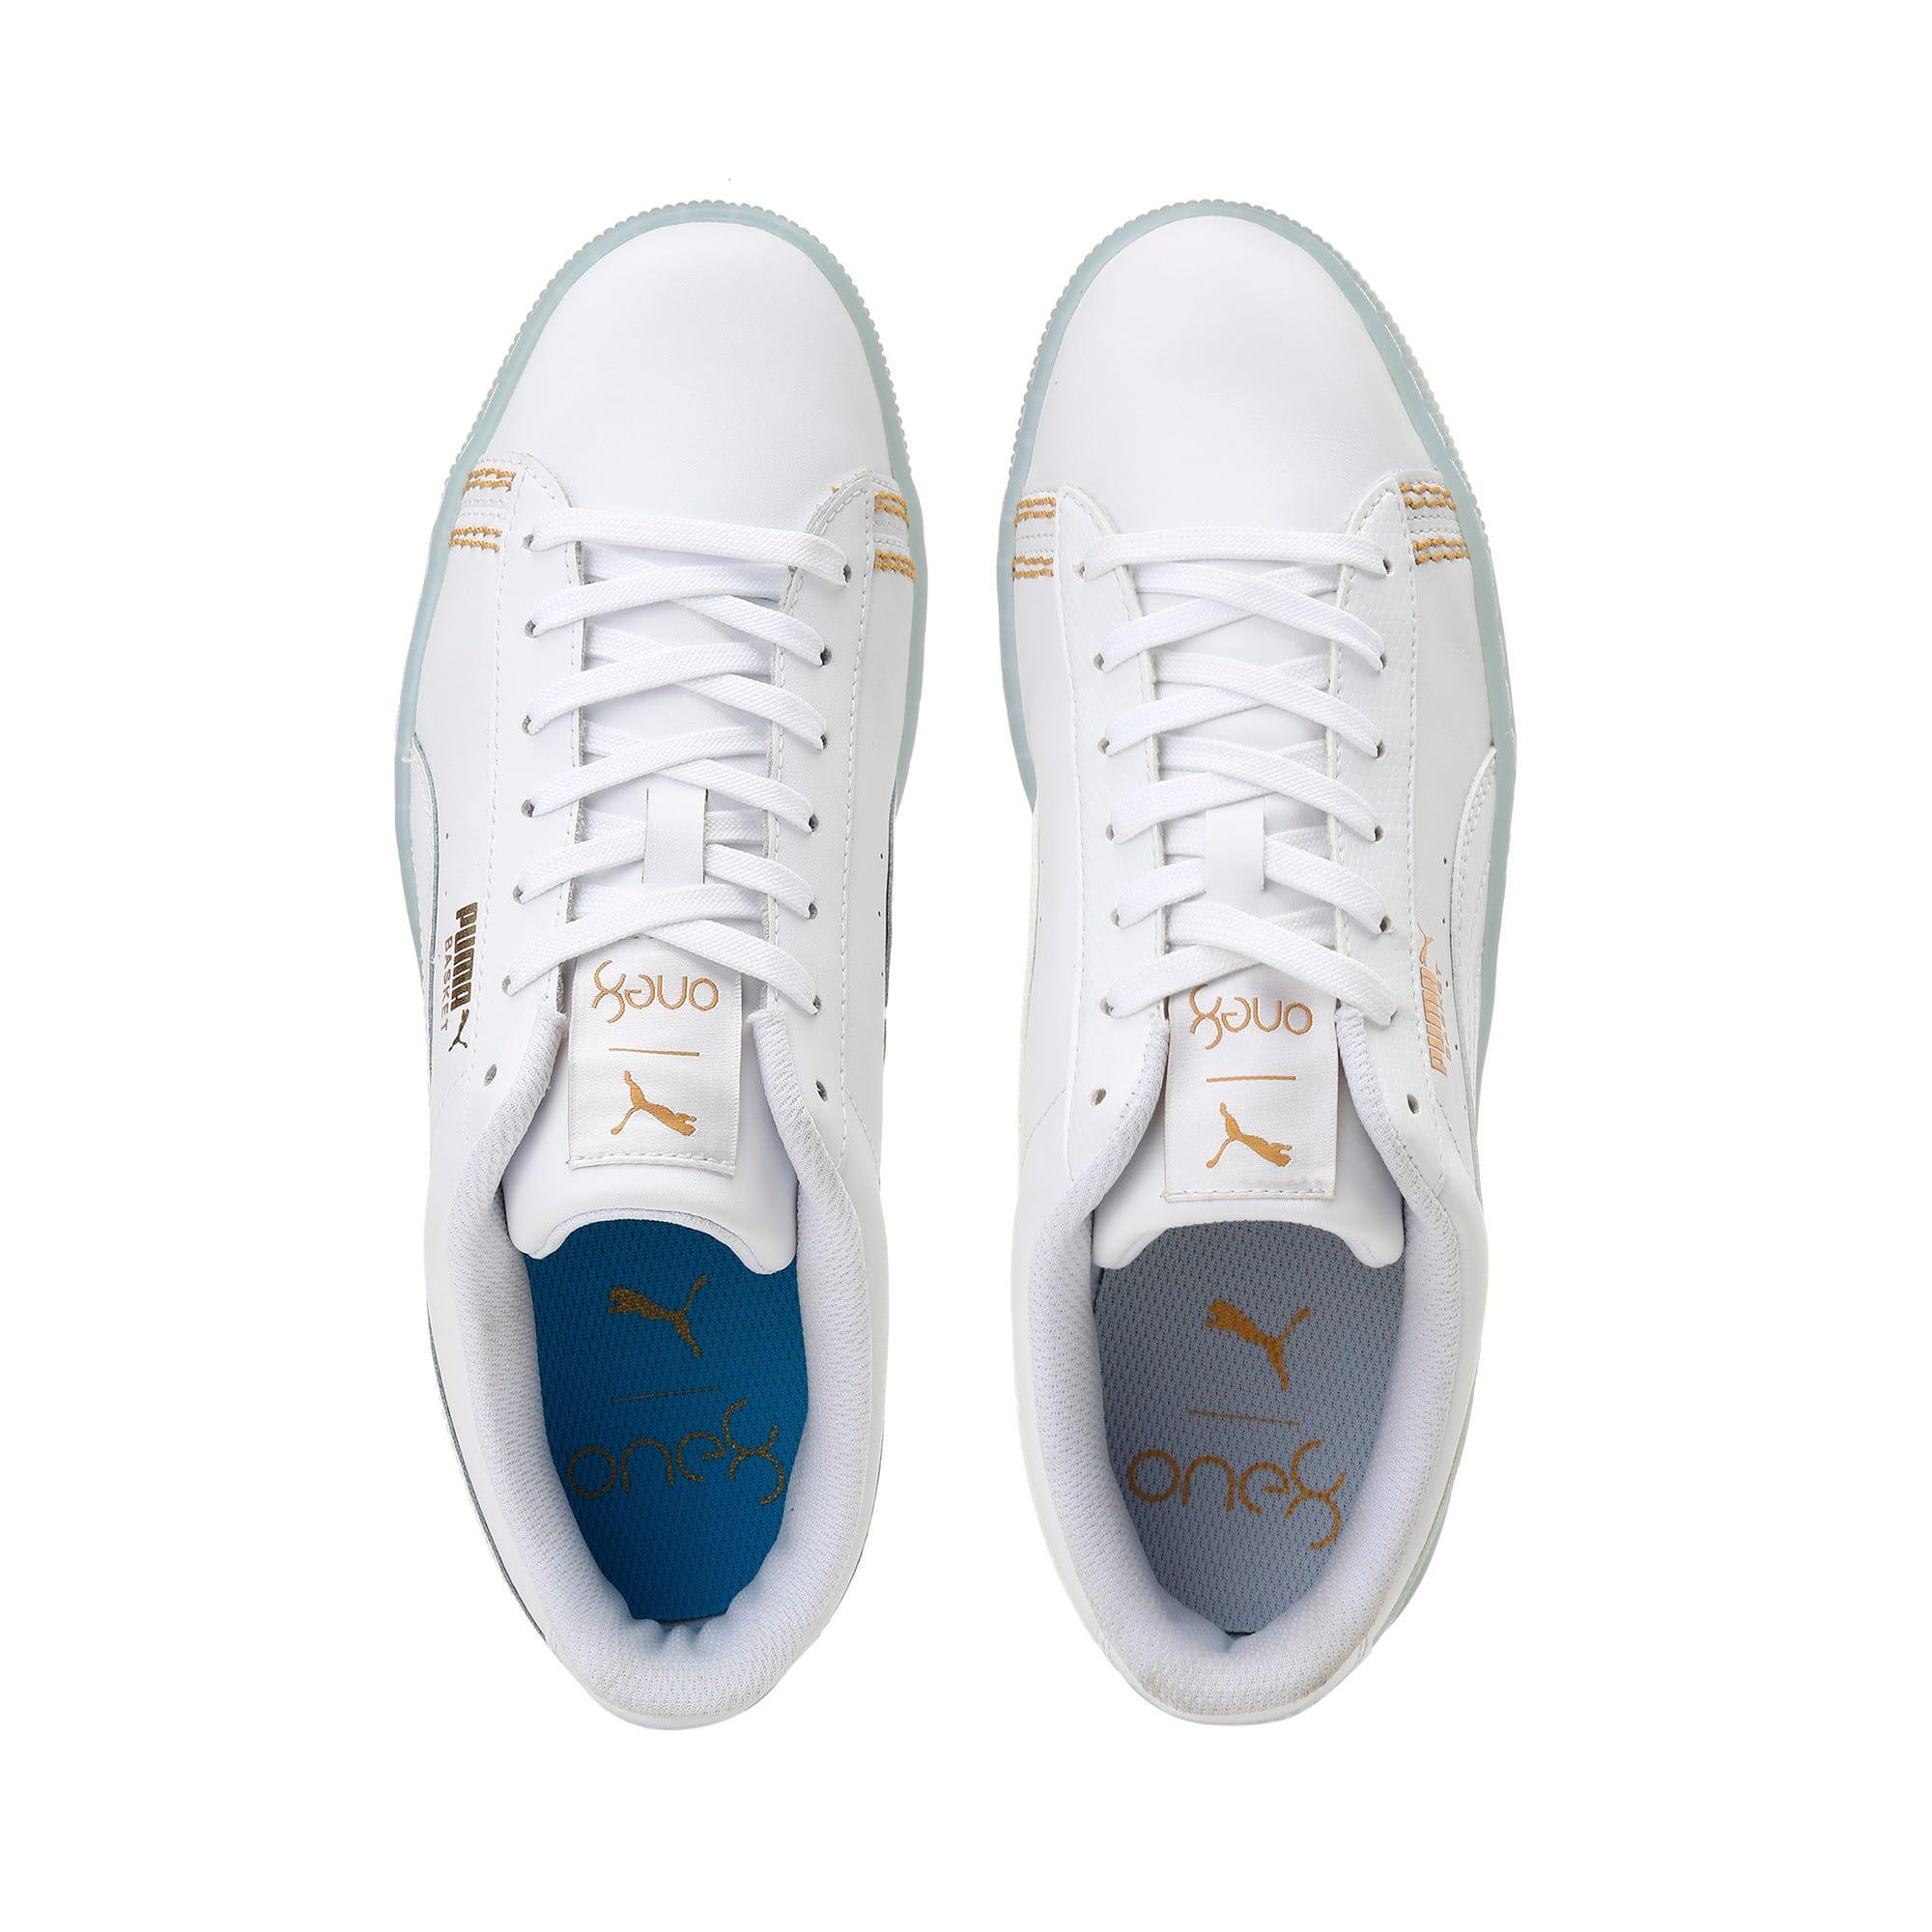 Thumbnail 6 of Basket Classic one8 Unisex Sneakers, White-Team Gold-Bleu Azur, medium-IND